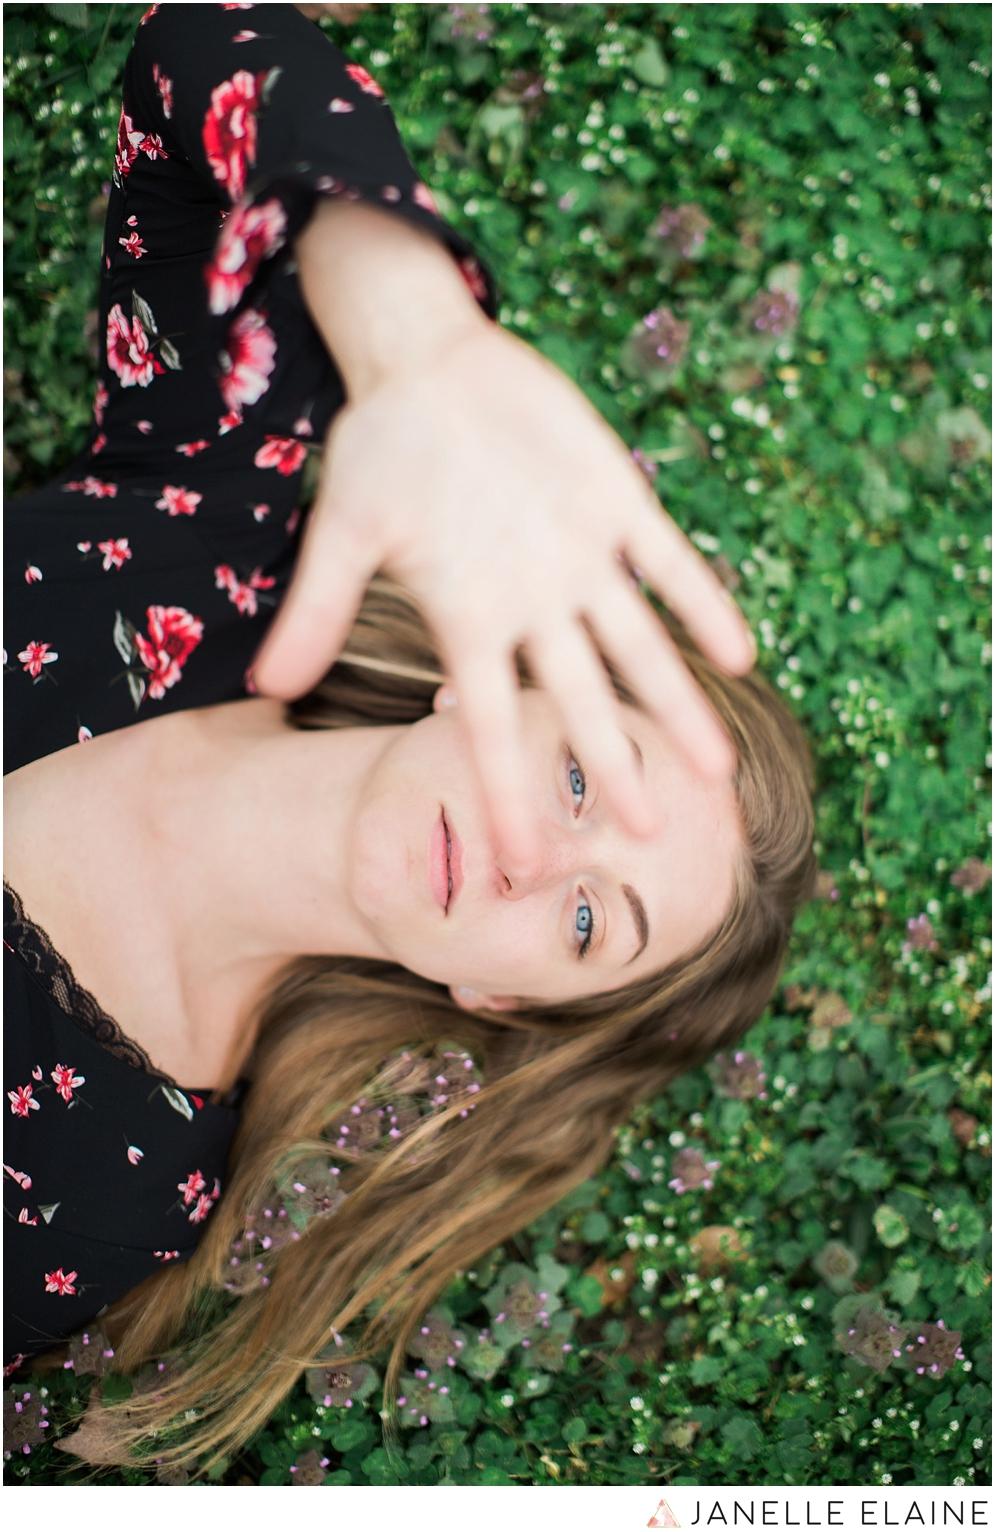 kirsi-renton wa portrait sesssion-cherry blossom-h&m dress-seattle photographer janelle elaine photography-40.jpg